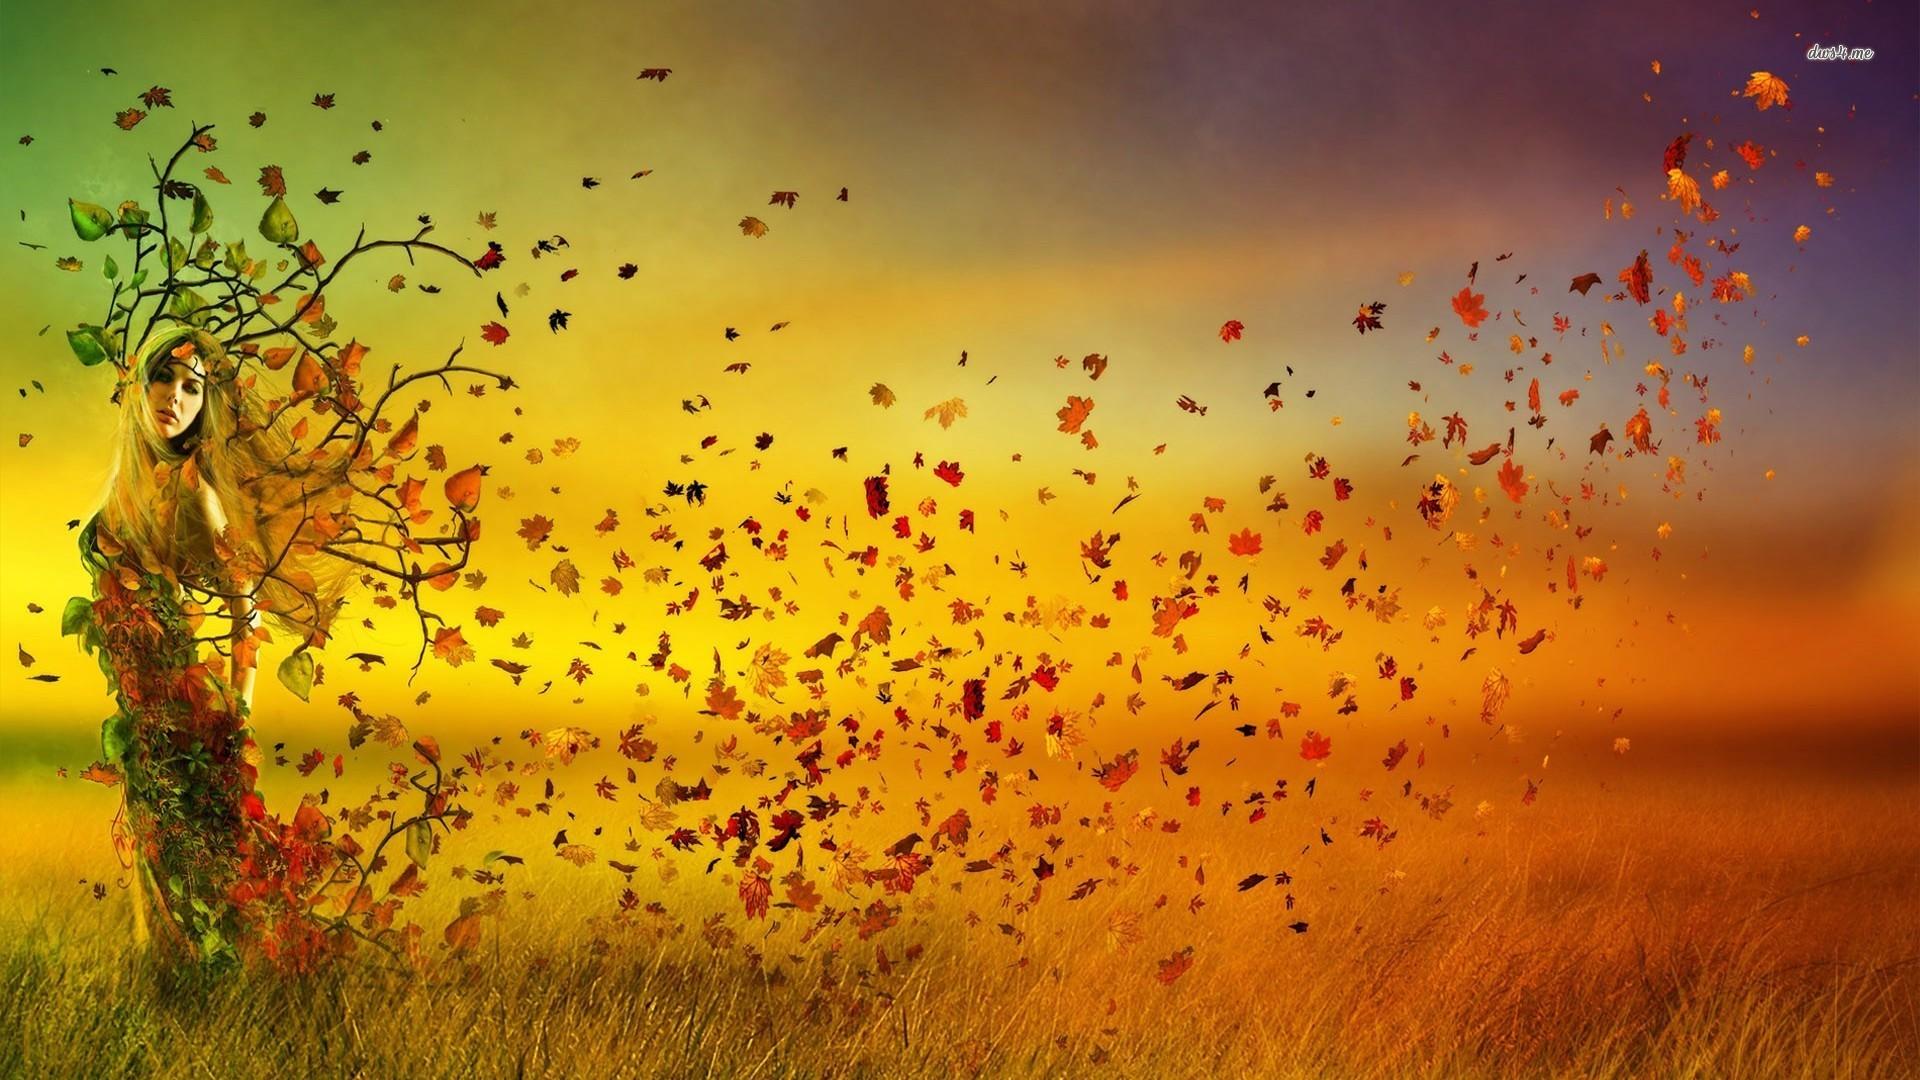 Autumn Wallpaper 1920x1080 (72+ Pictures